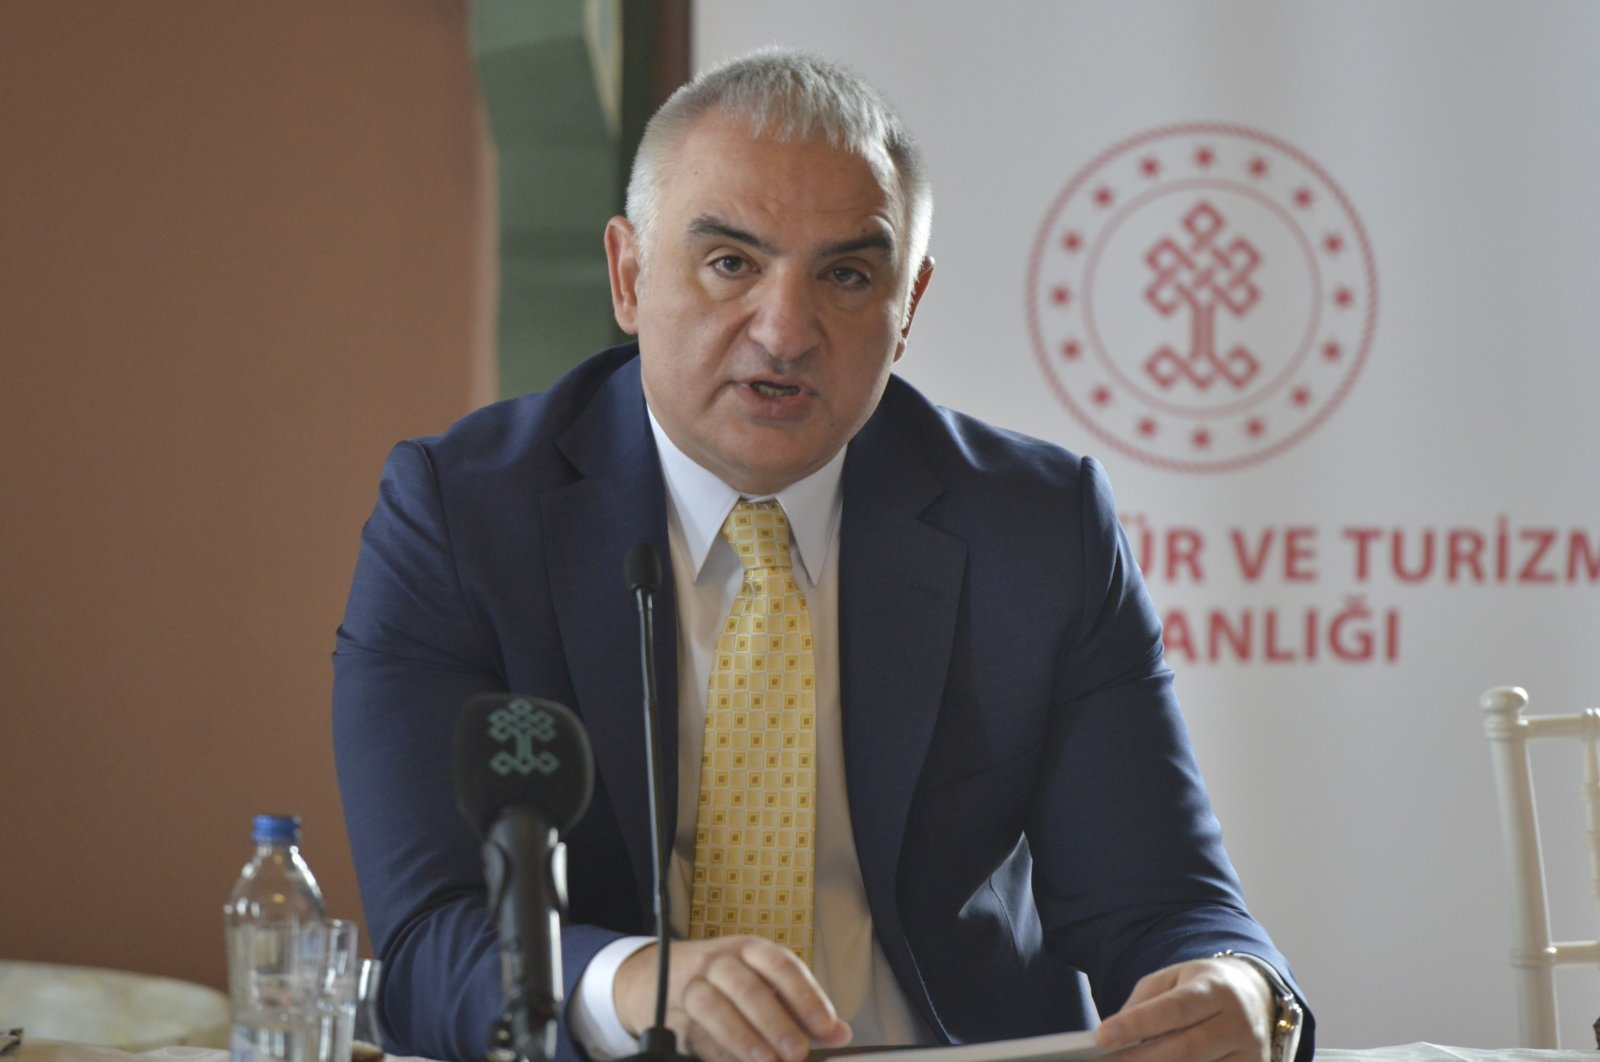 Culture and Tourism Minister Mehmet Nuri Ersoy speaking to media representatives in Ankara, Jan. 12, 2020 (IHA Photo)